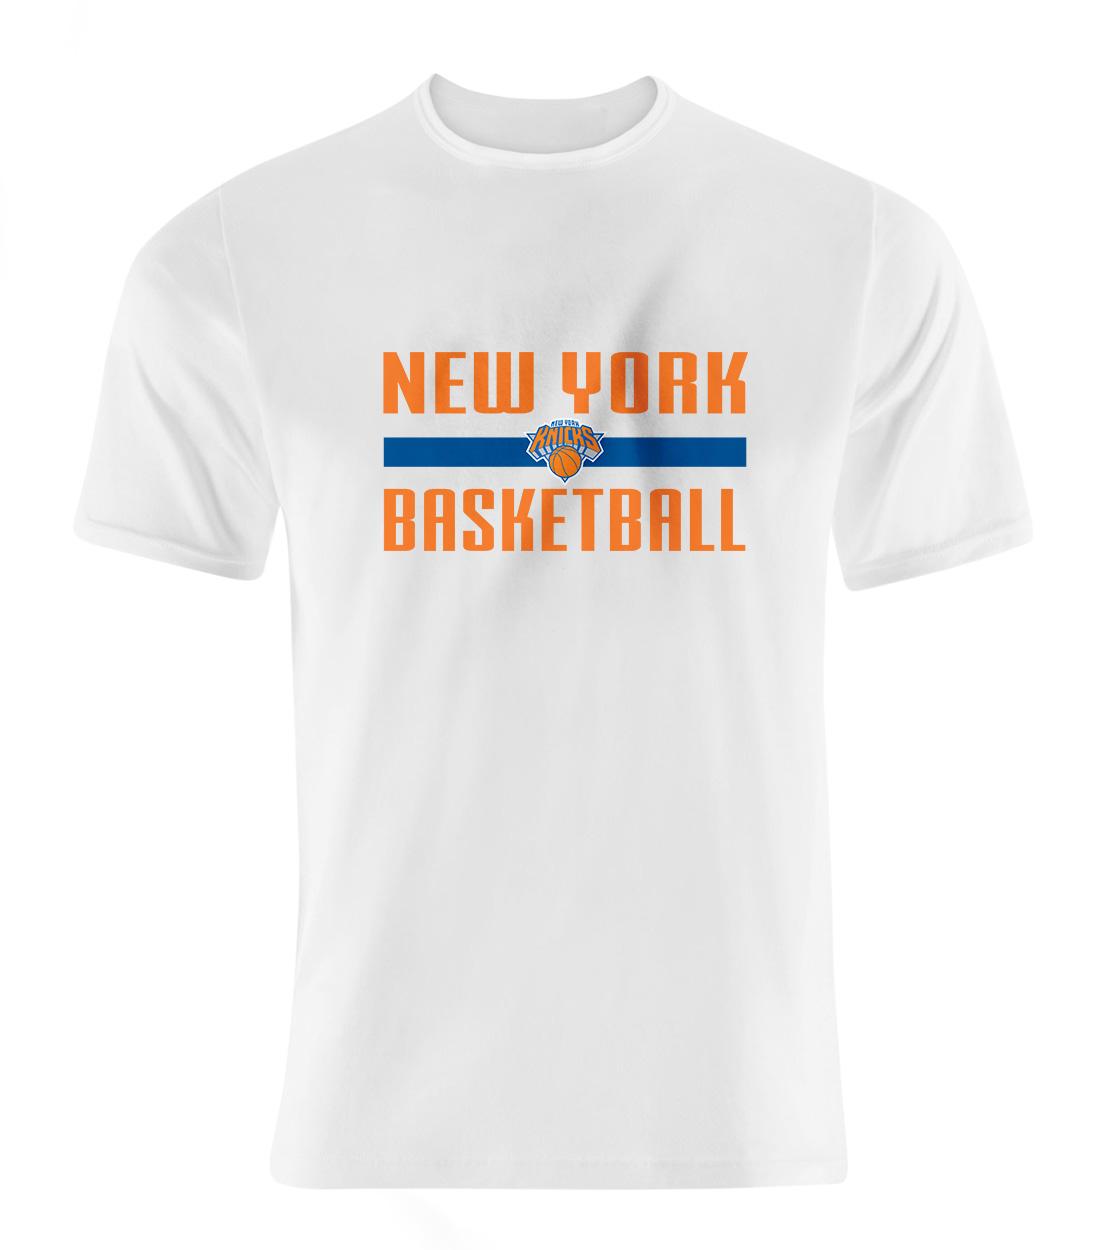 New York Knicks Basketball Tshirt (TSH-WHT-SKR-knicks-bsktbll-531)